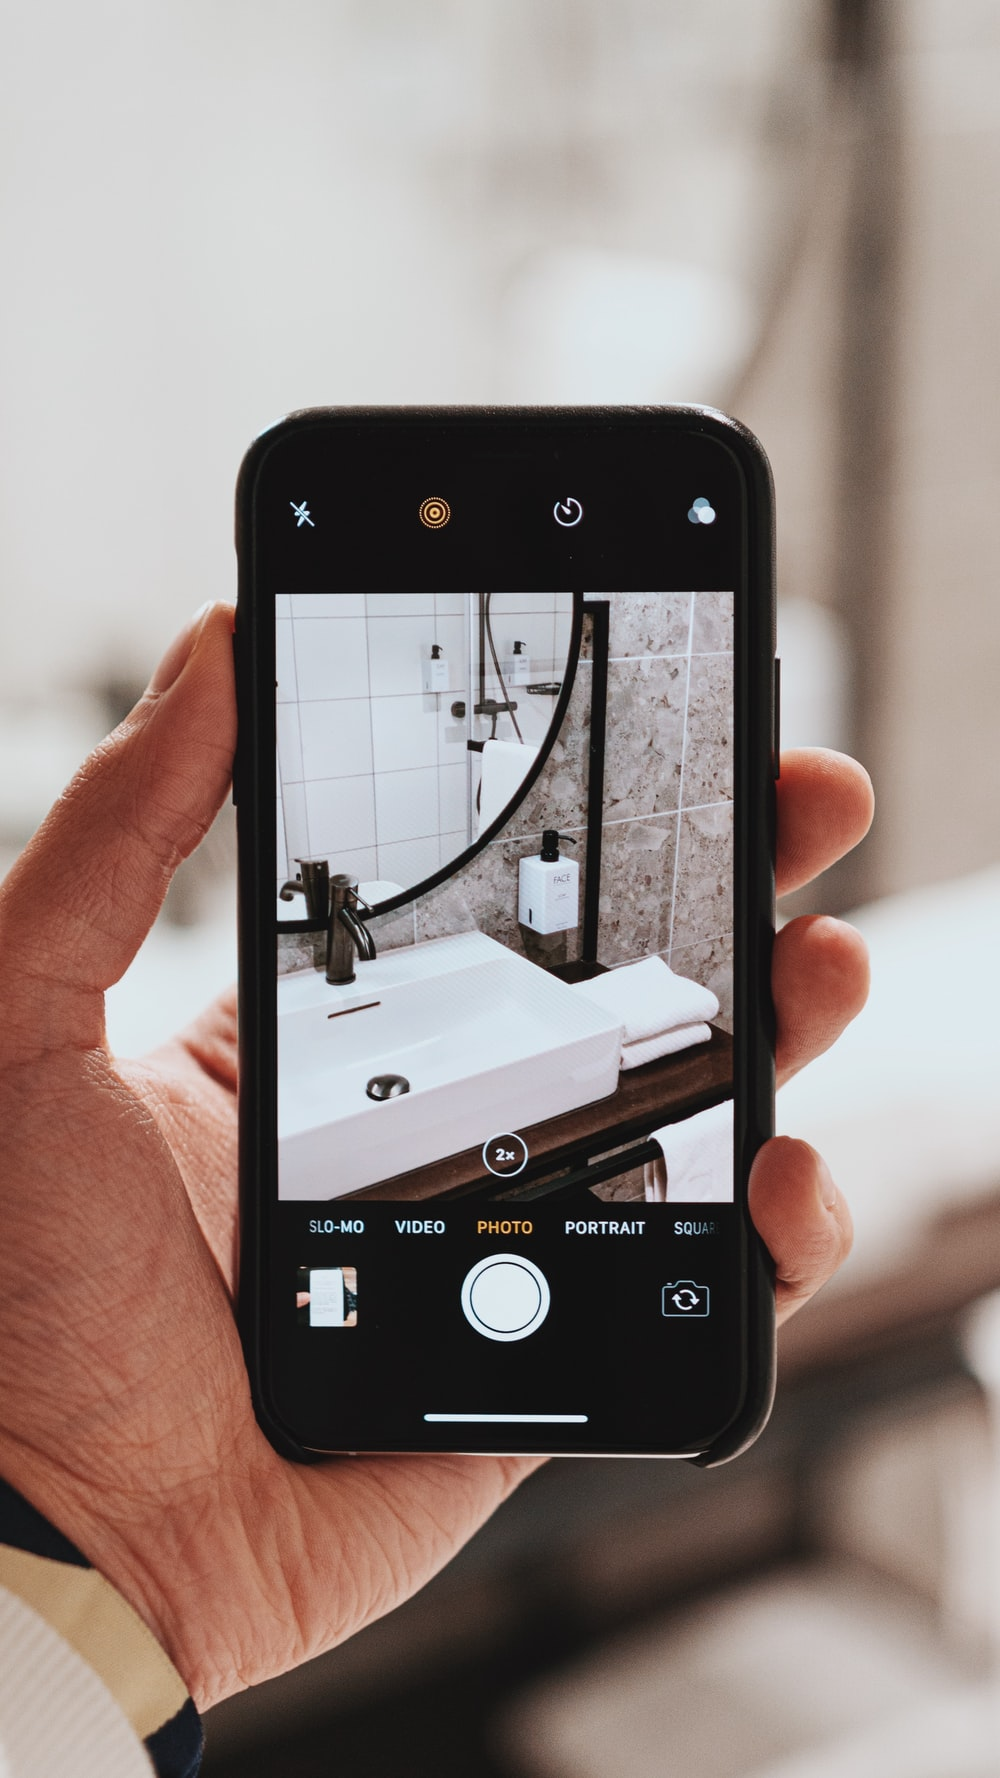 turned-on black Android smartphone